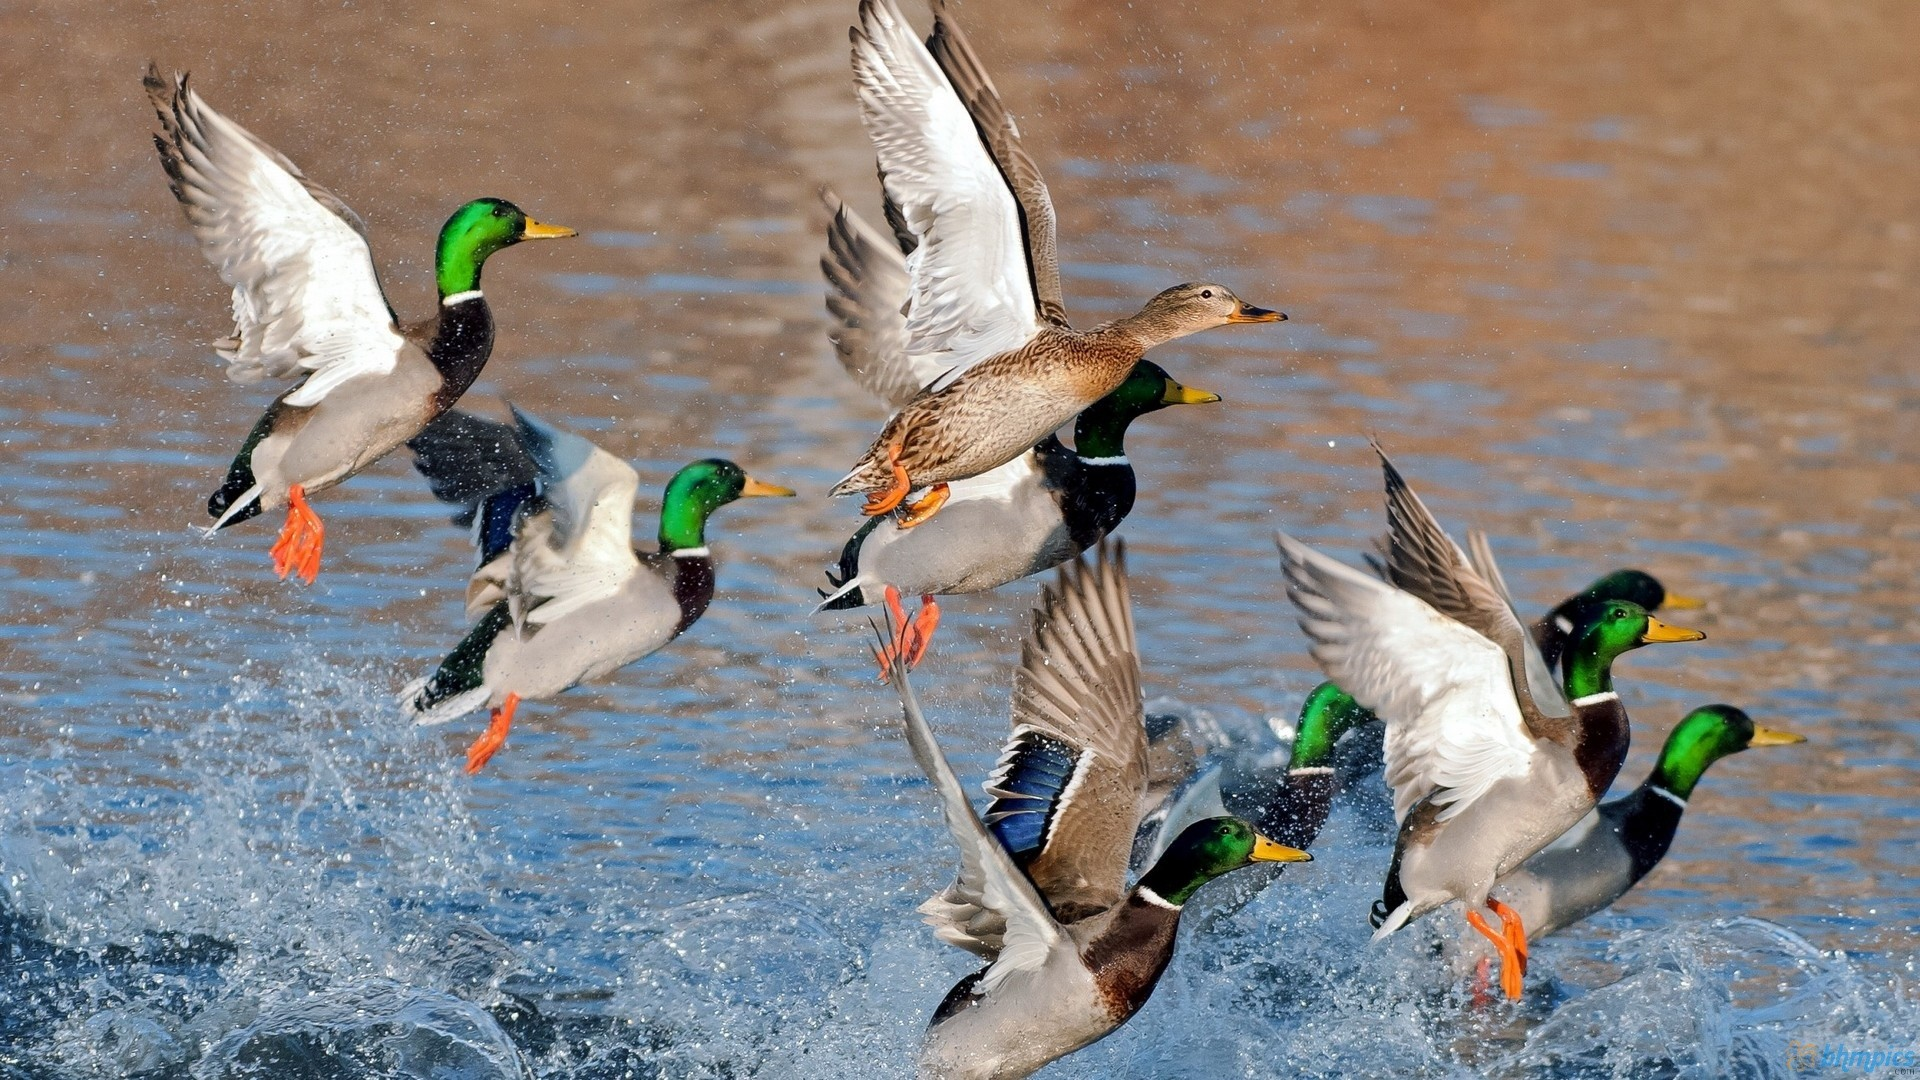 Duck Hunting Wallpaper   Data Src Large Duck Hunting - Best Duck - HD Wallpaper